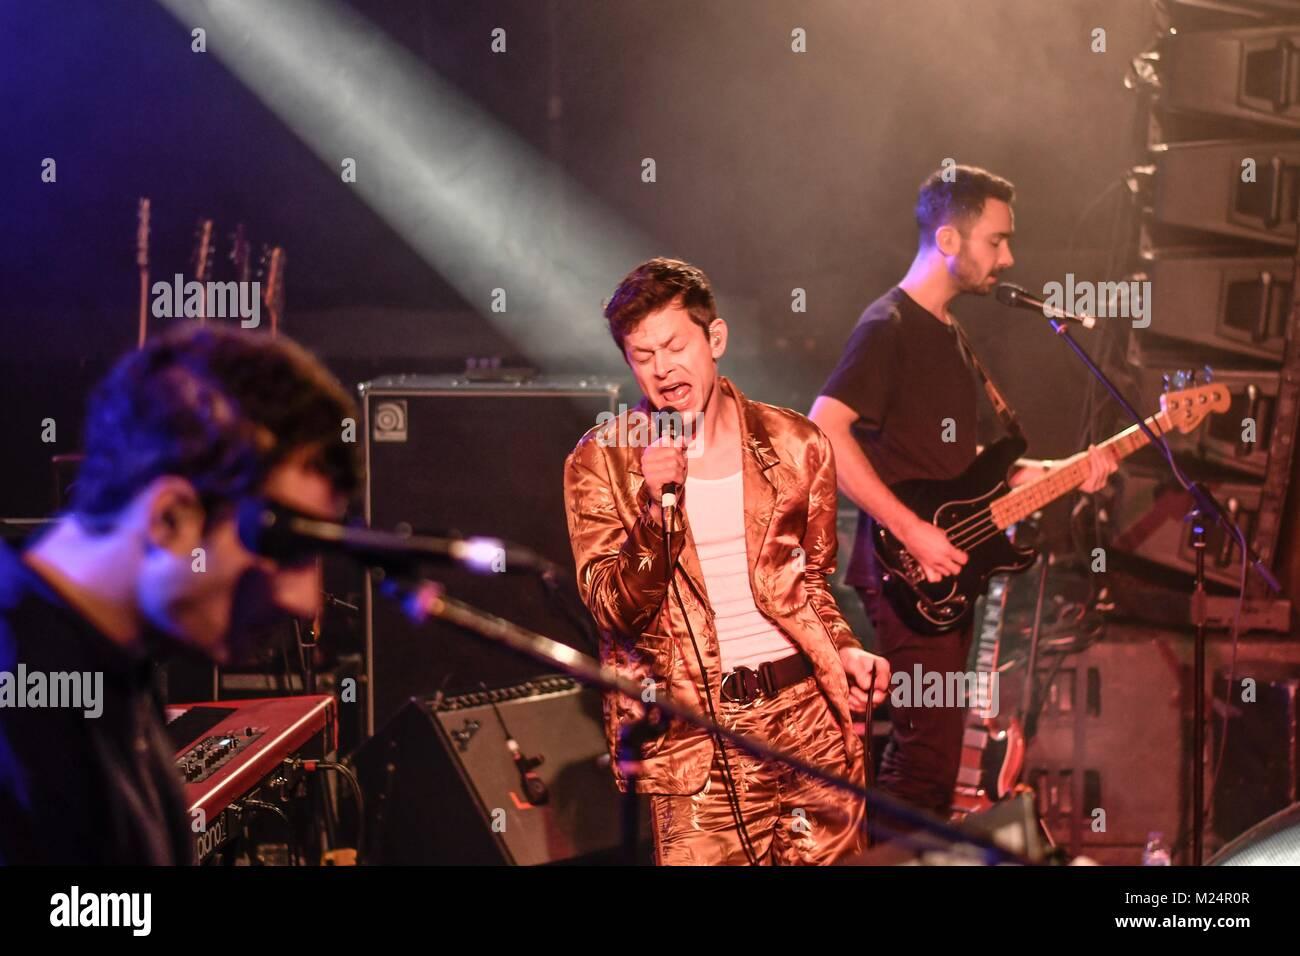 Perfume Genius performing live at Liverpool Music Week 2017 - Stock Image